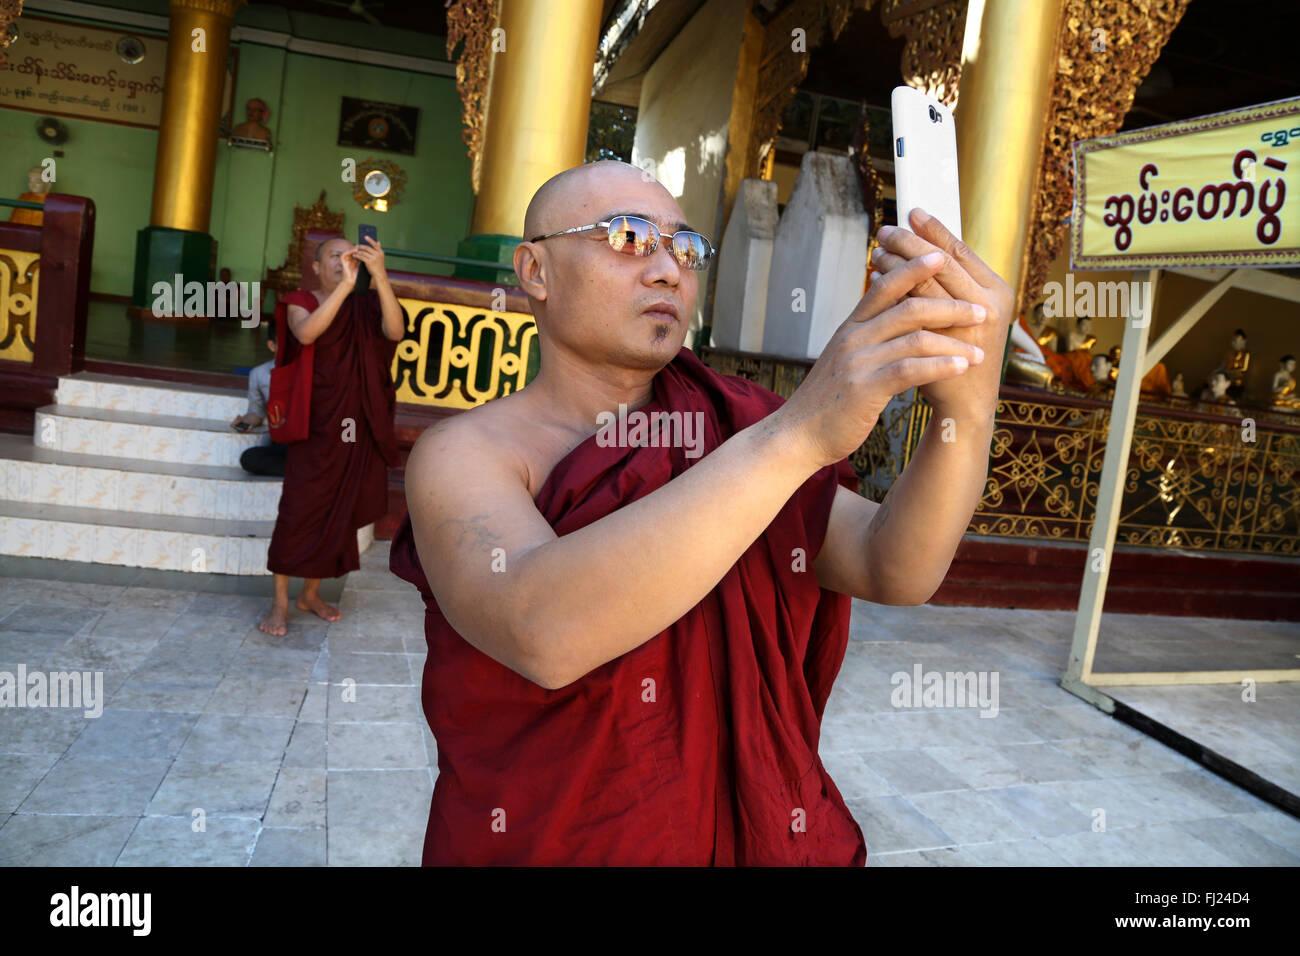 Monaco buddista tenendo selfie con telefono in Shwedagon pagoda, Rangoon, Myanmar Immagini Stock